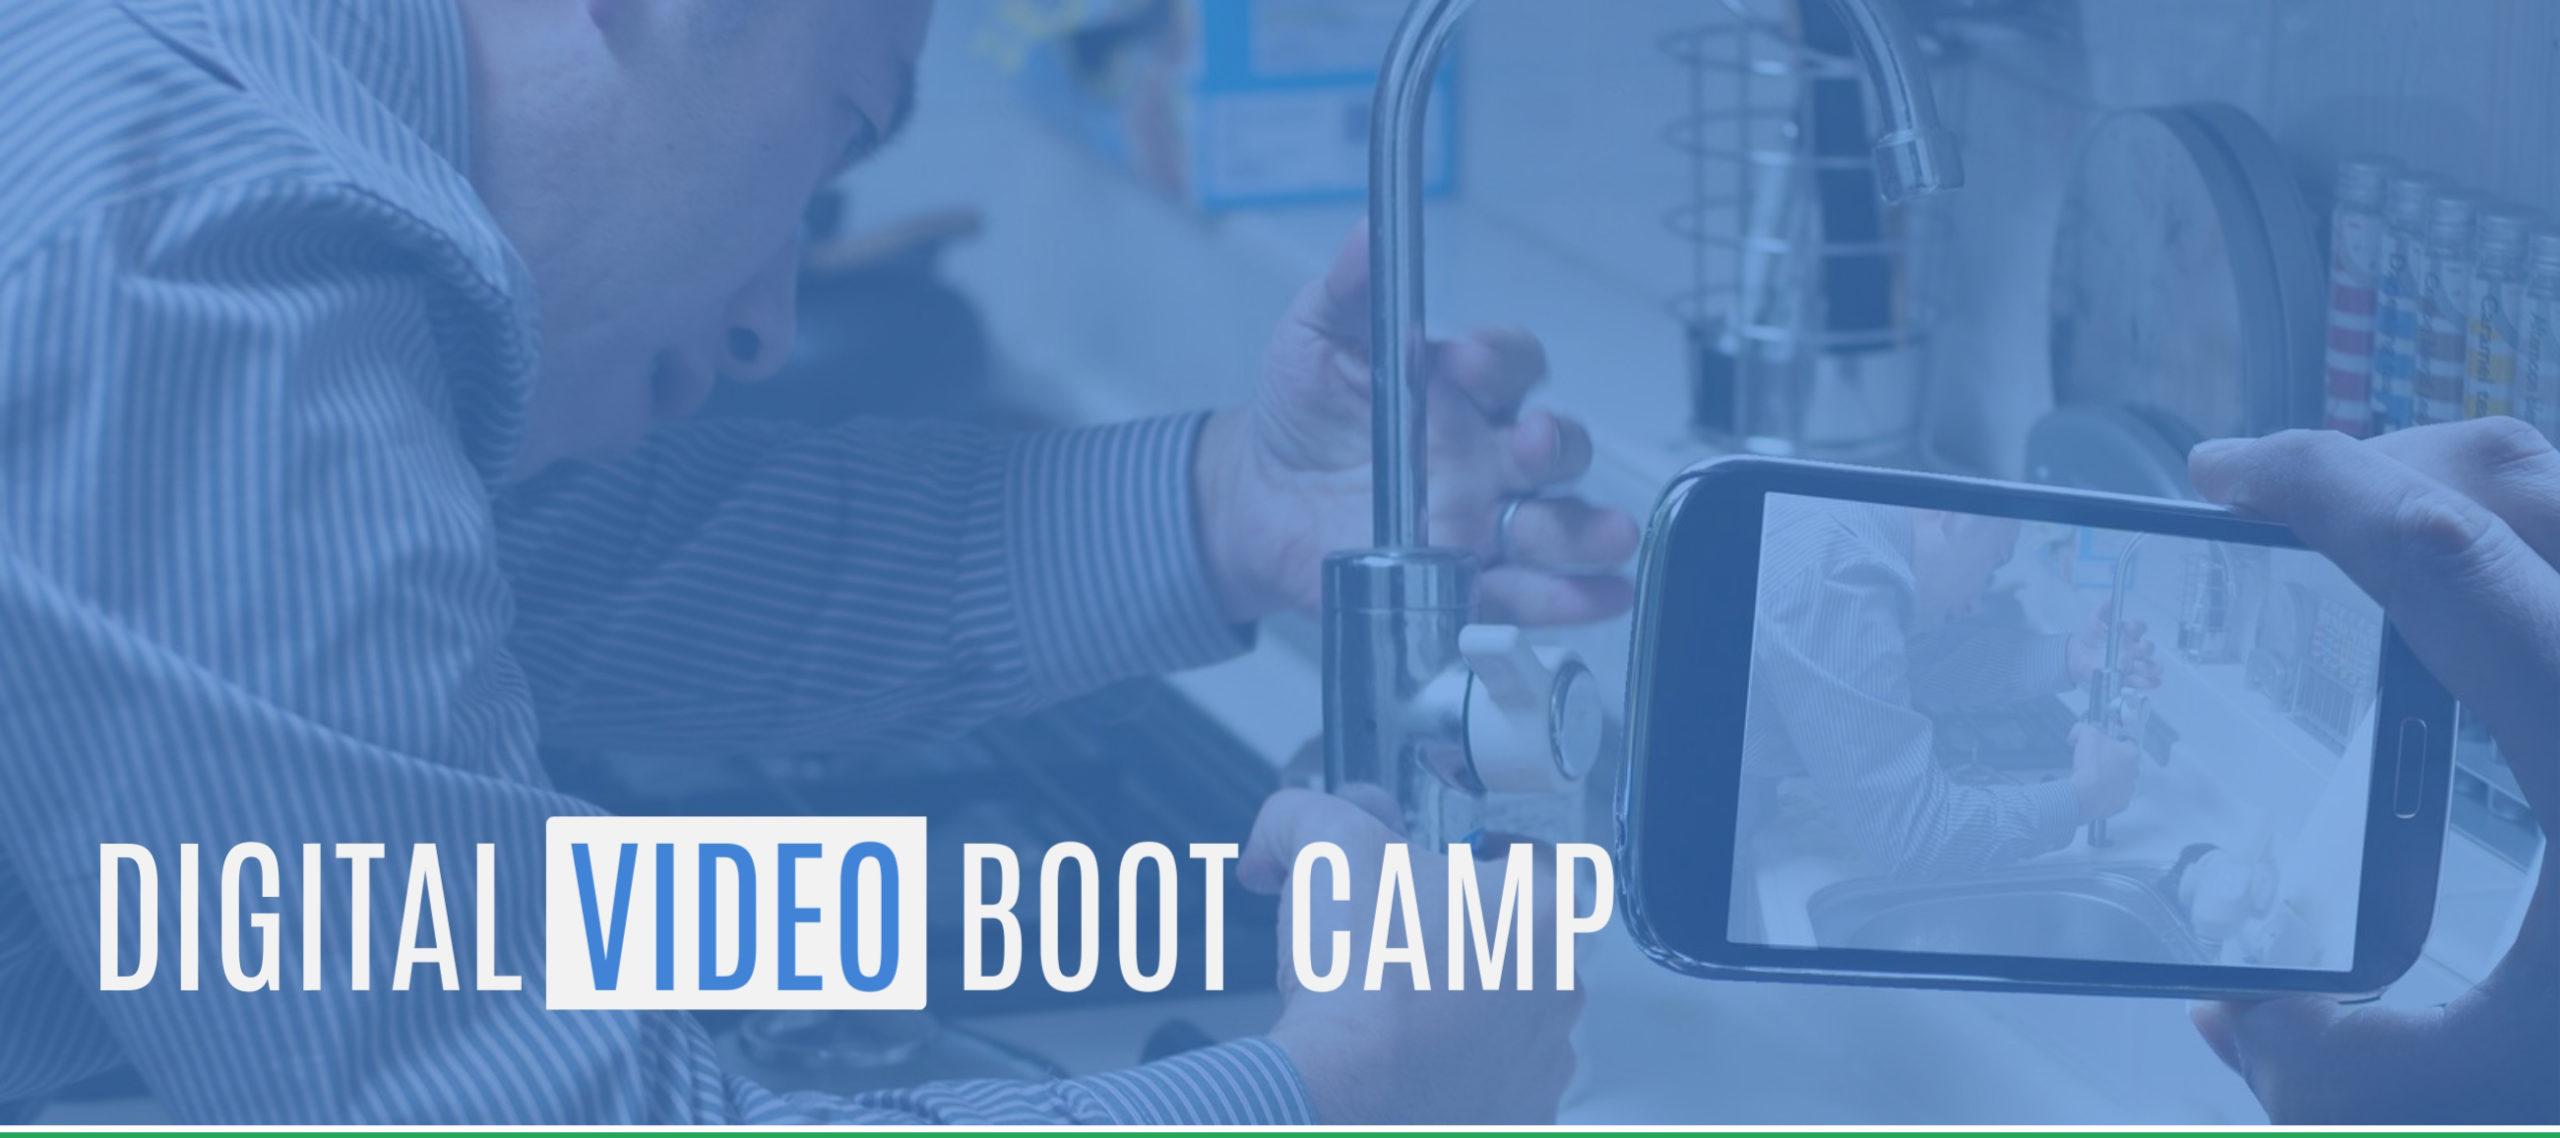 Video Boot Camp Jonathan Halls